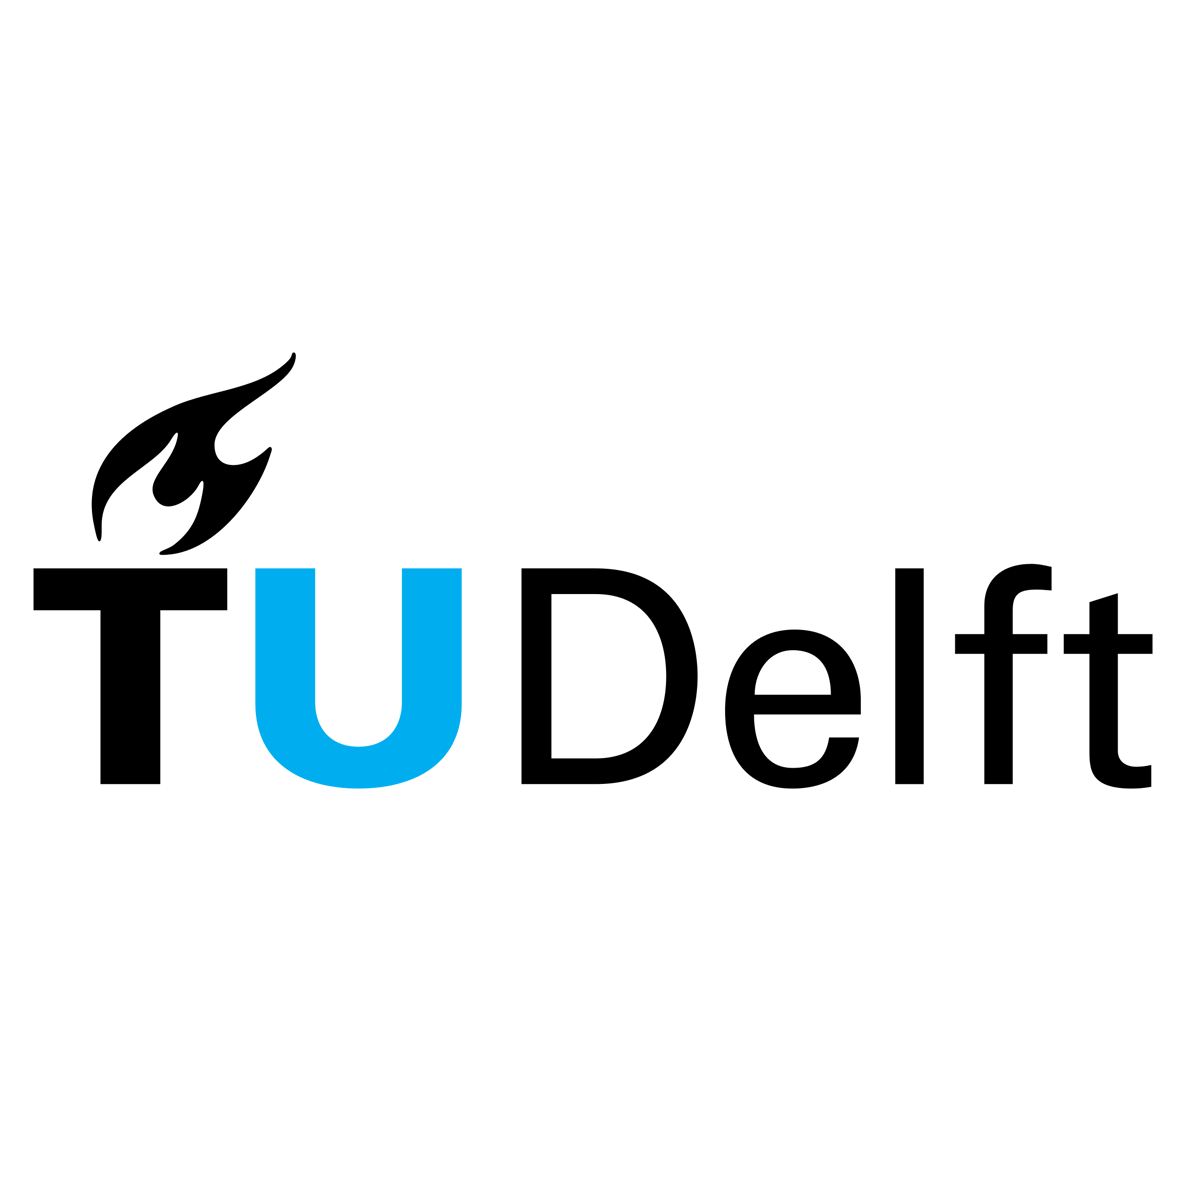 TU_Delft_Logo-1 (1)